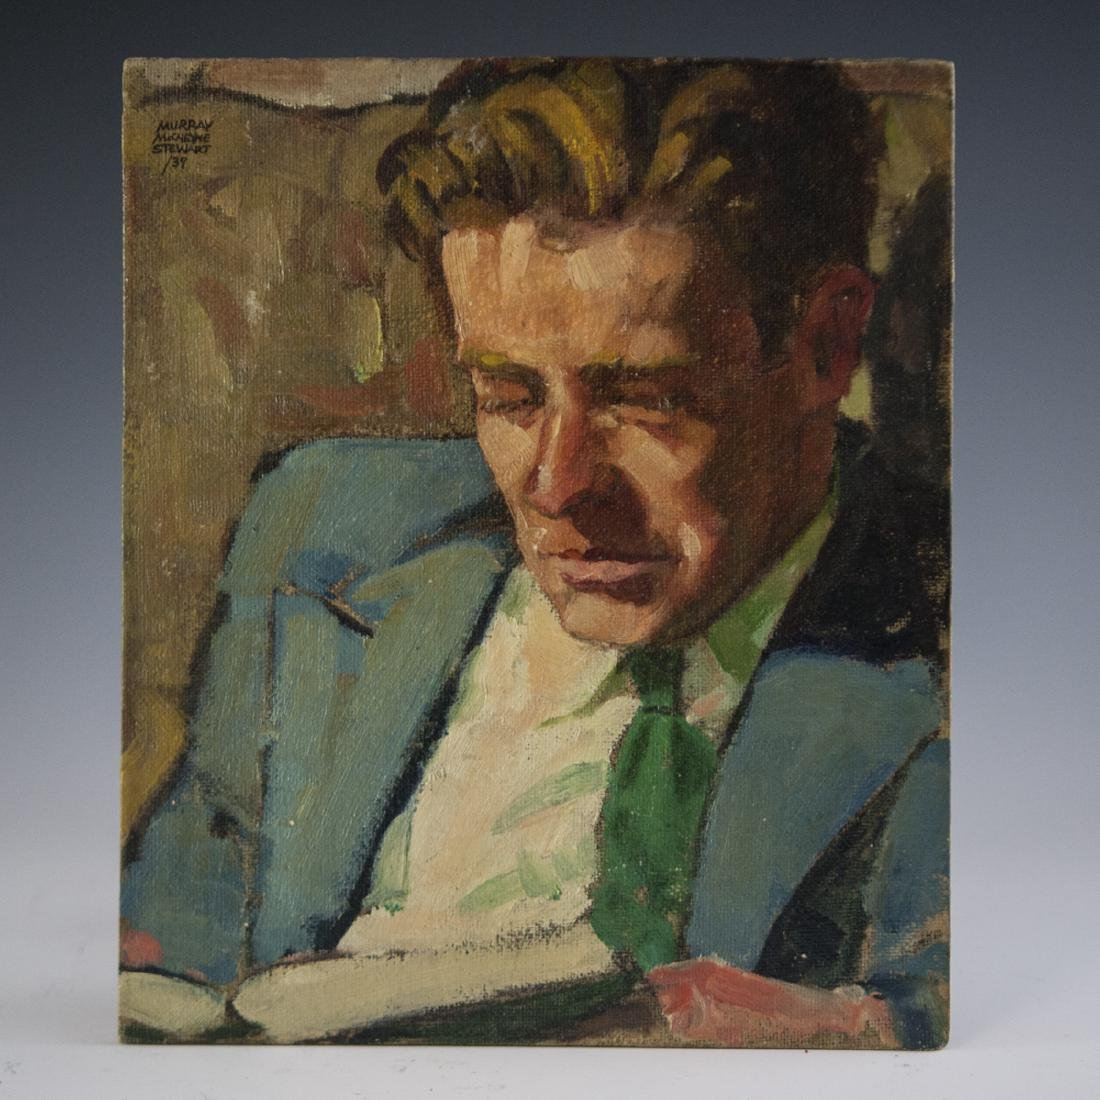 Murray Stewart (Canadian 1919-2006)